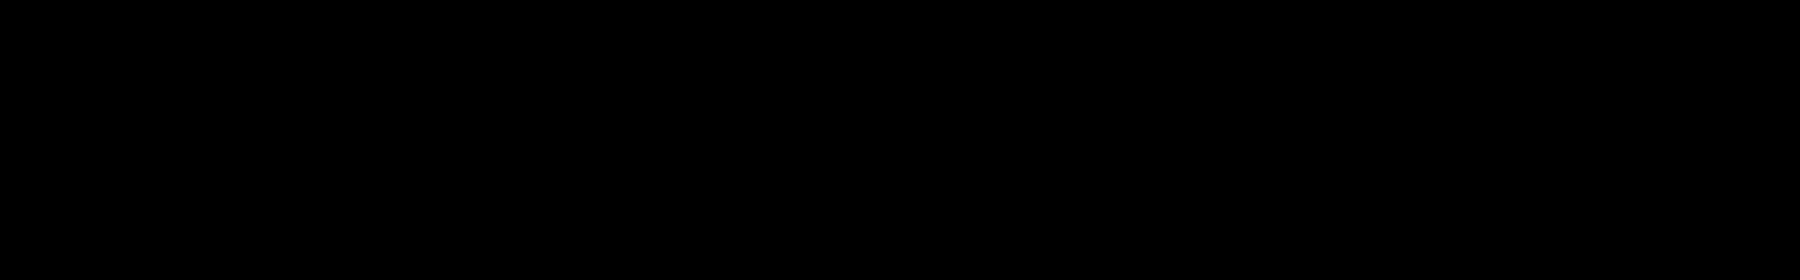 Dusk - Lofi Hip Hop audio waveform